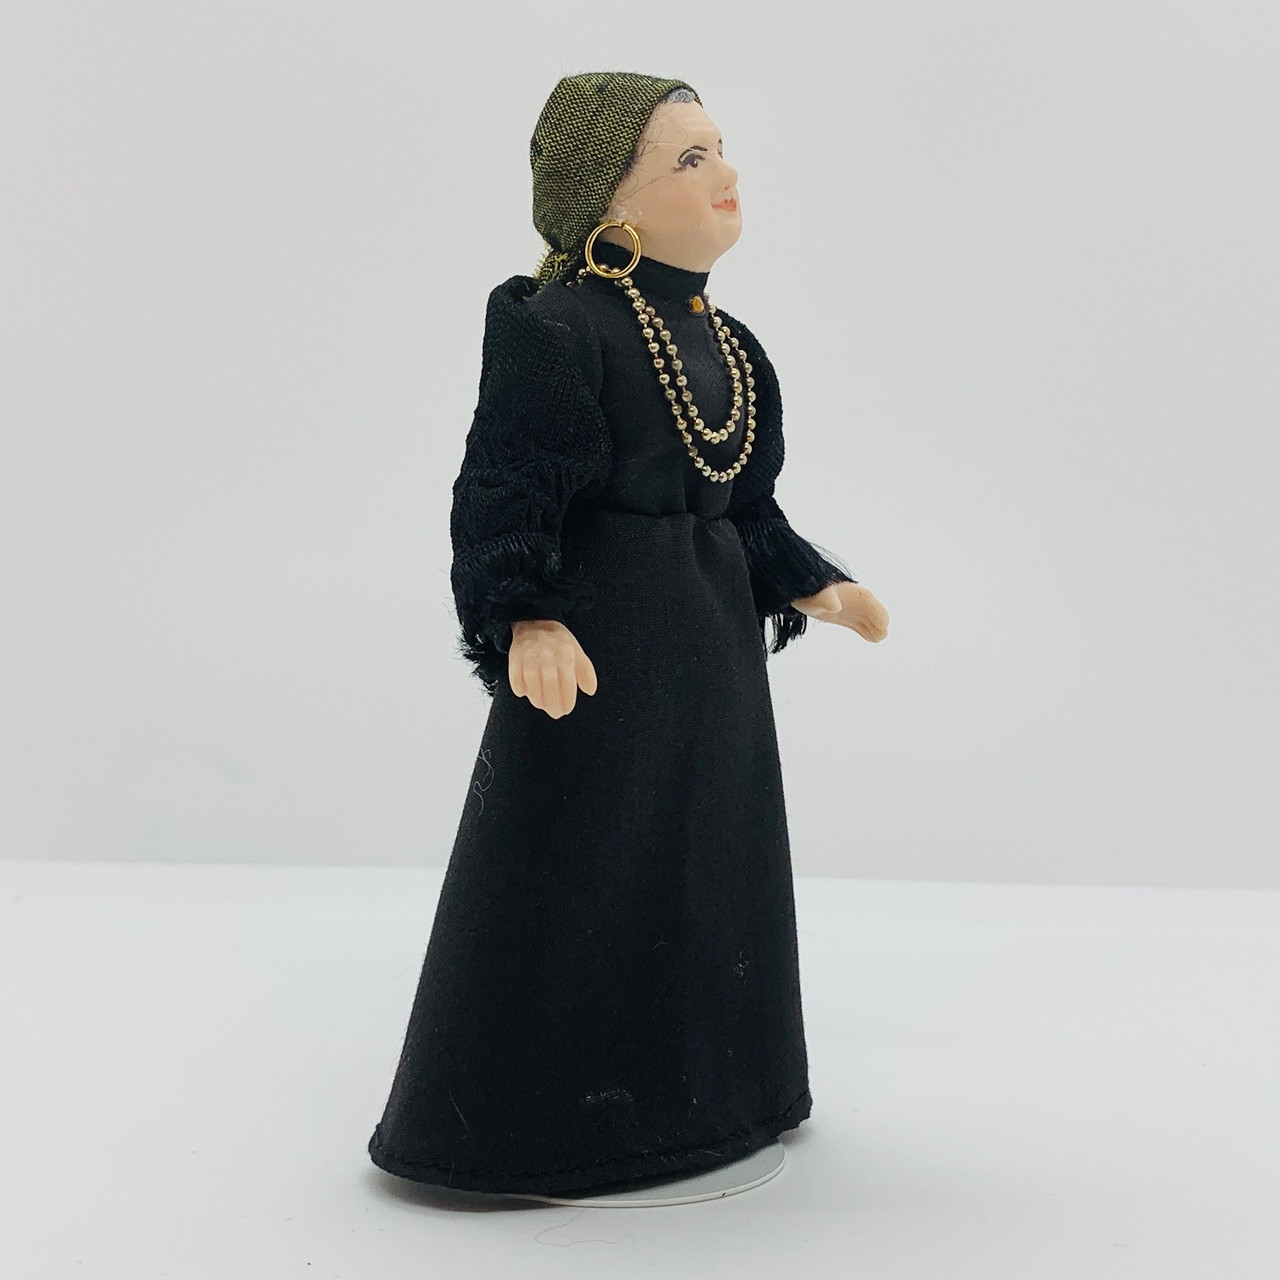 Dollhouse Miniature Fortune Teller, Female (CDD2041)